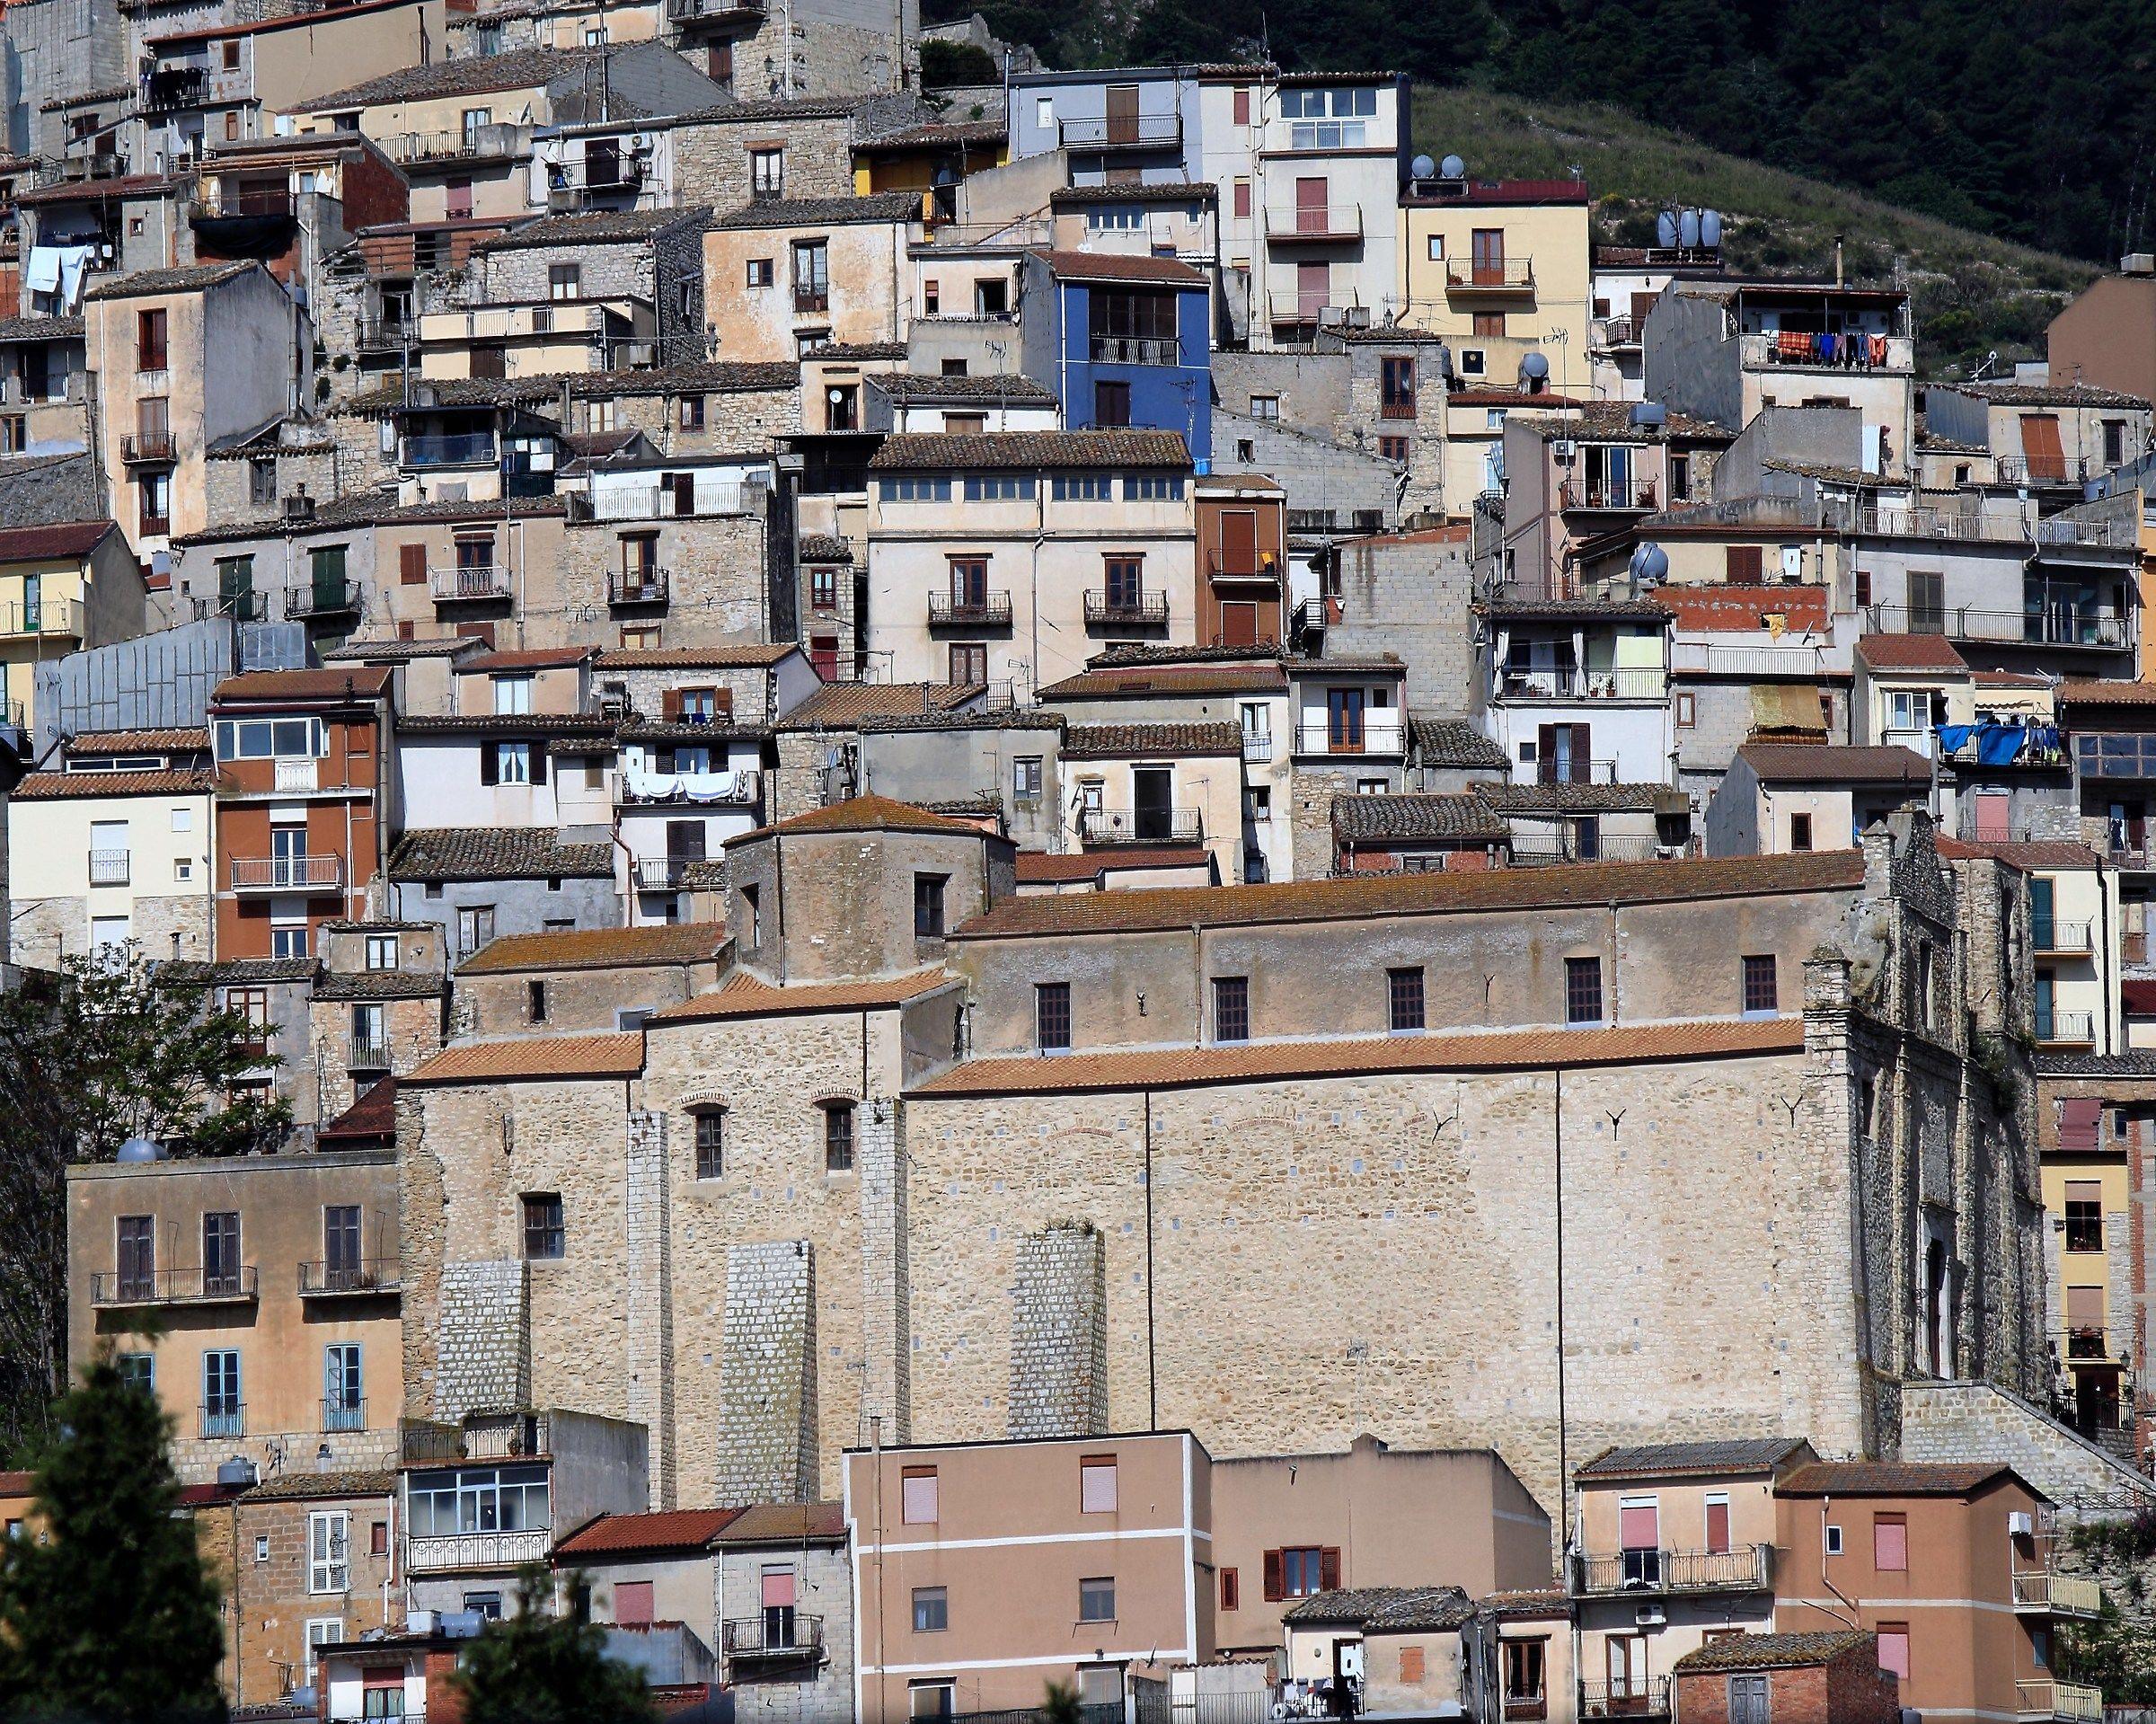 Church St. Vito Cammarata...